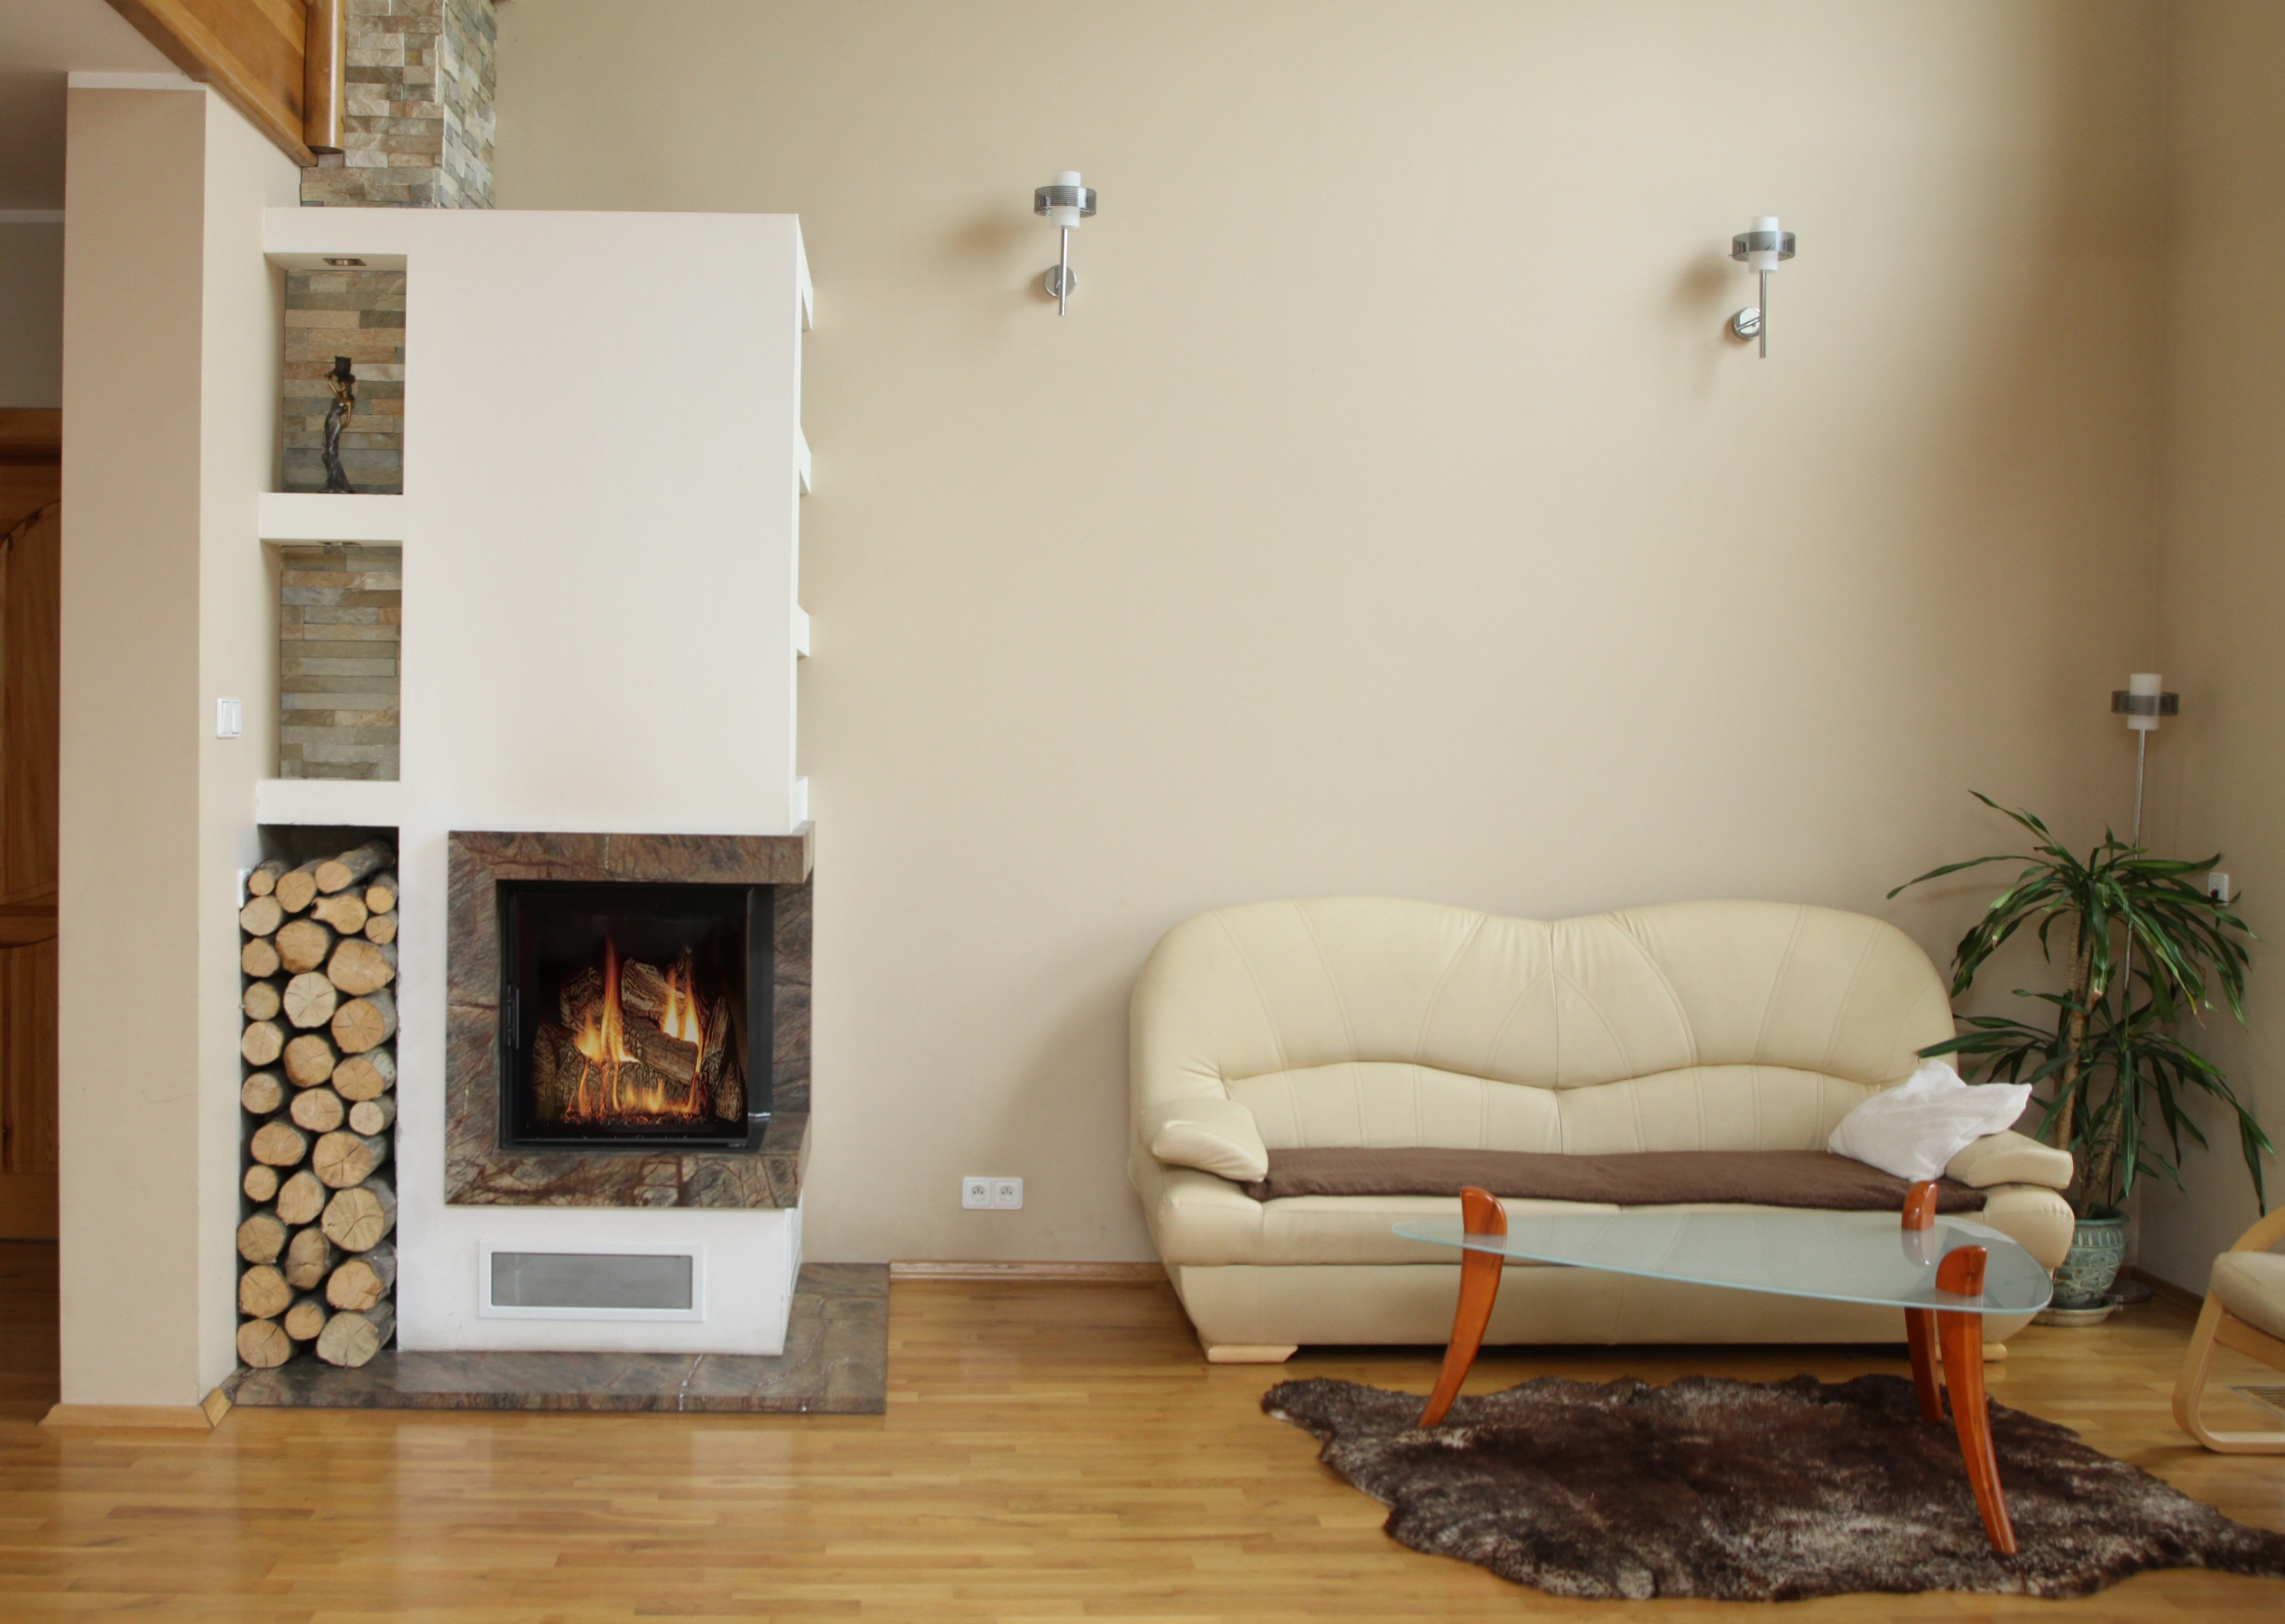 eckkamin modern a 09 mit spartherm mit montage www. Black Bedroom Furniture Sets. Home Design Ideas